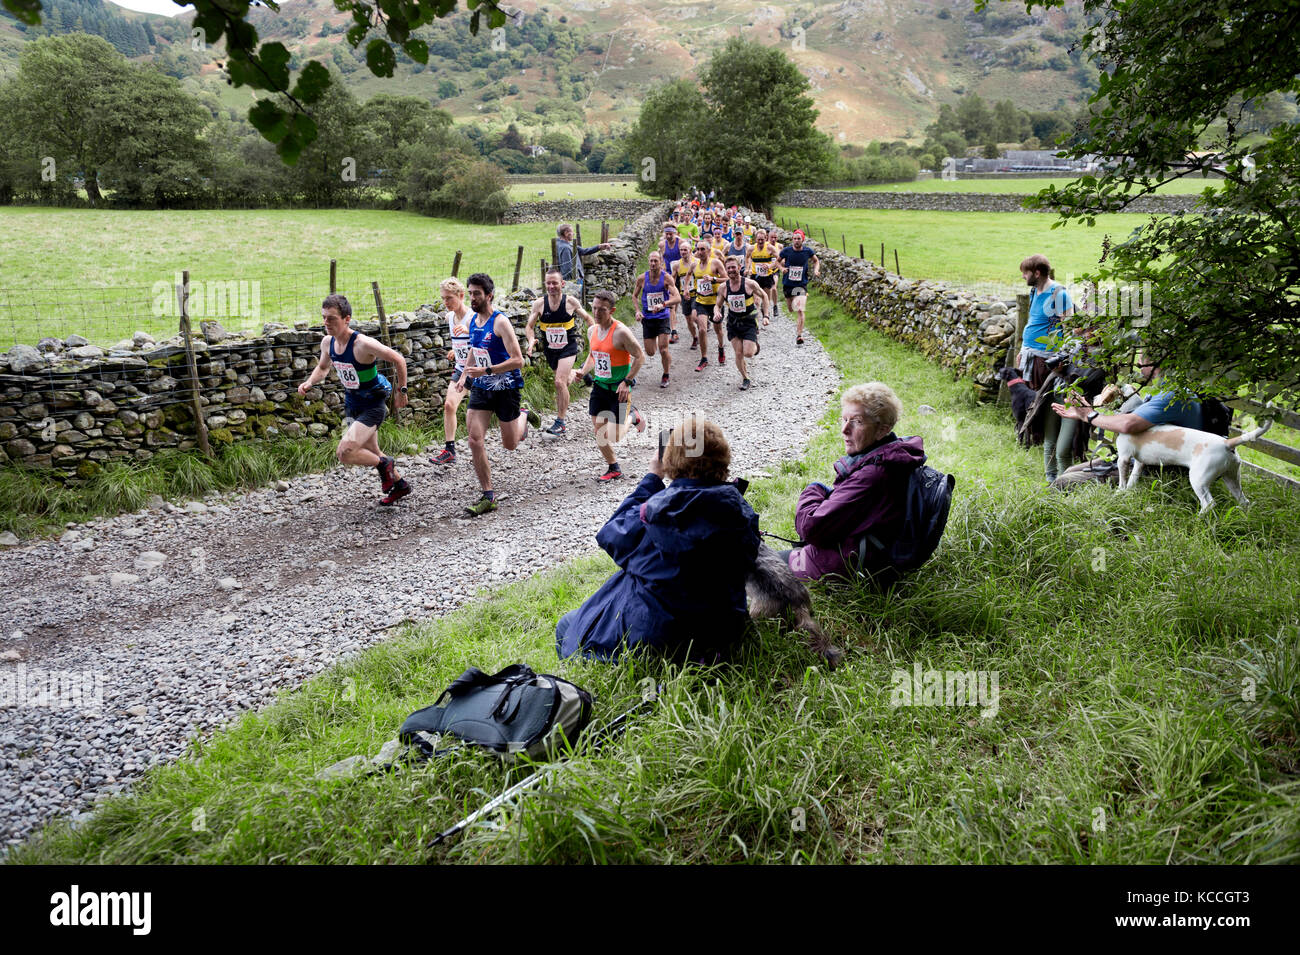 The start of the fell race, Borrowdale Shepherds Meet, Rosthwaite, Keswick, Cumbria, UK - Stock Image